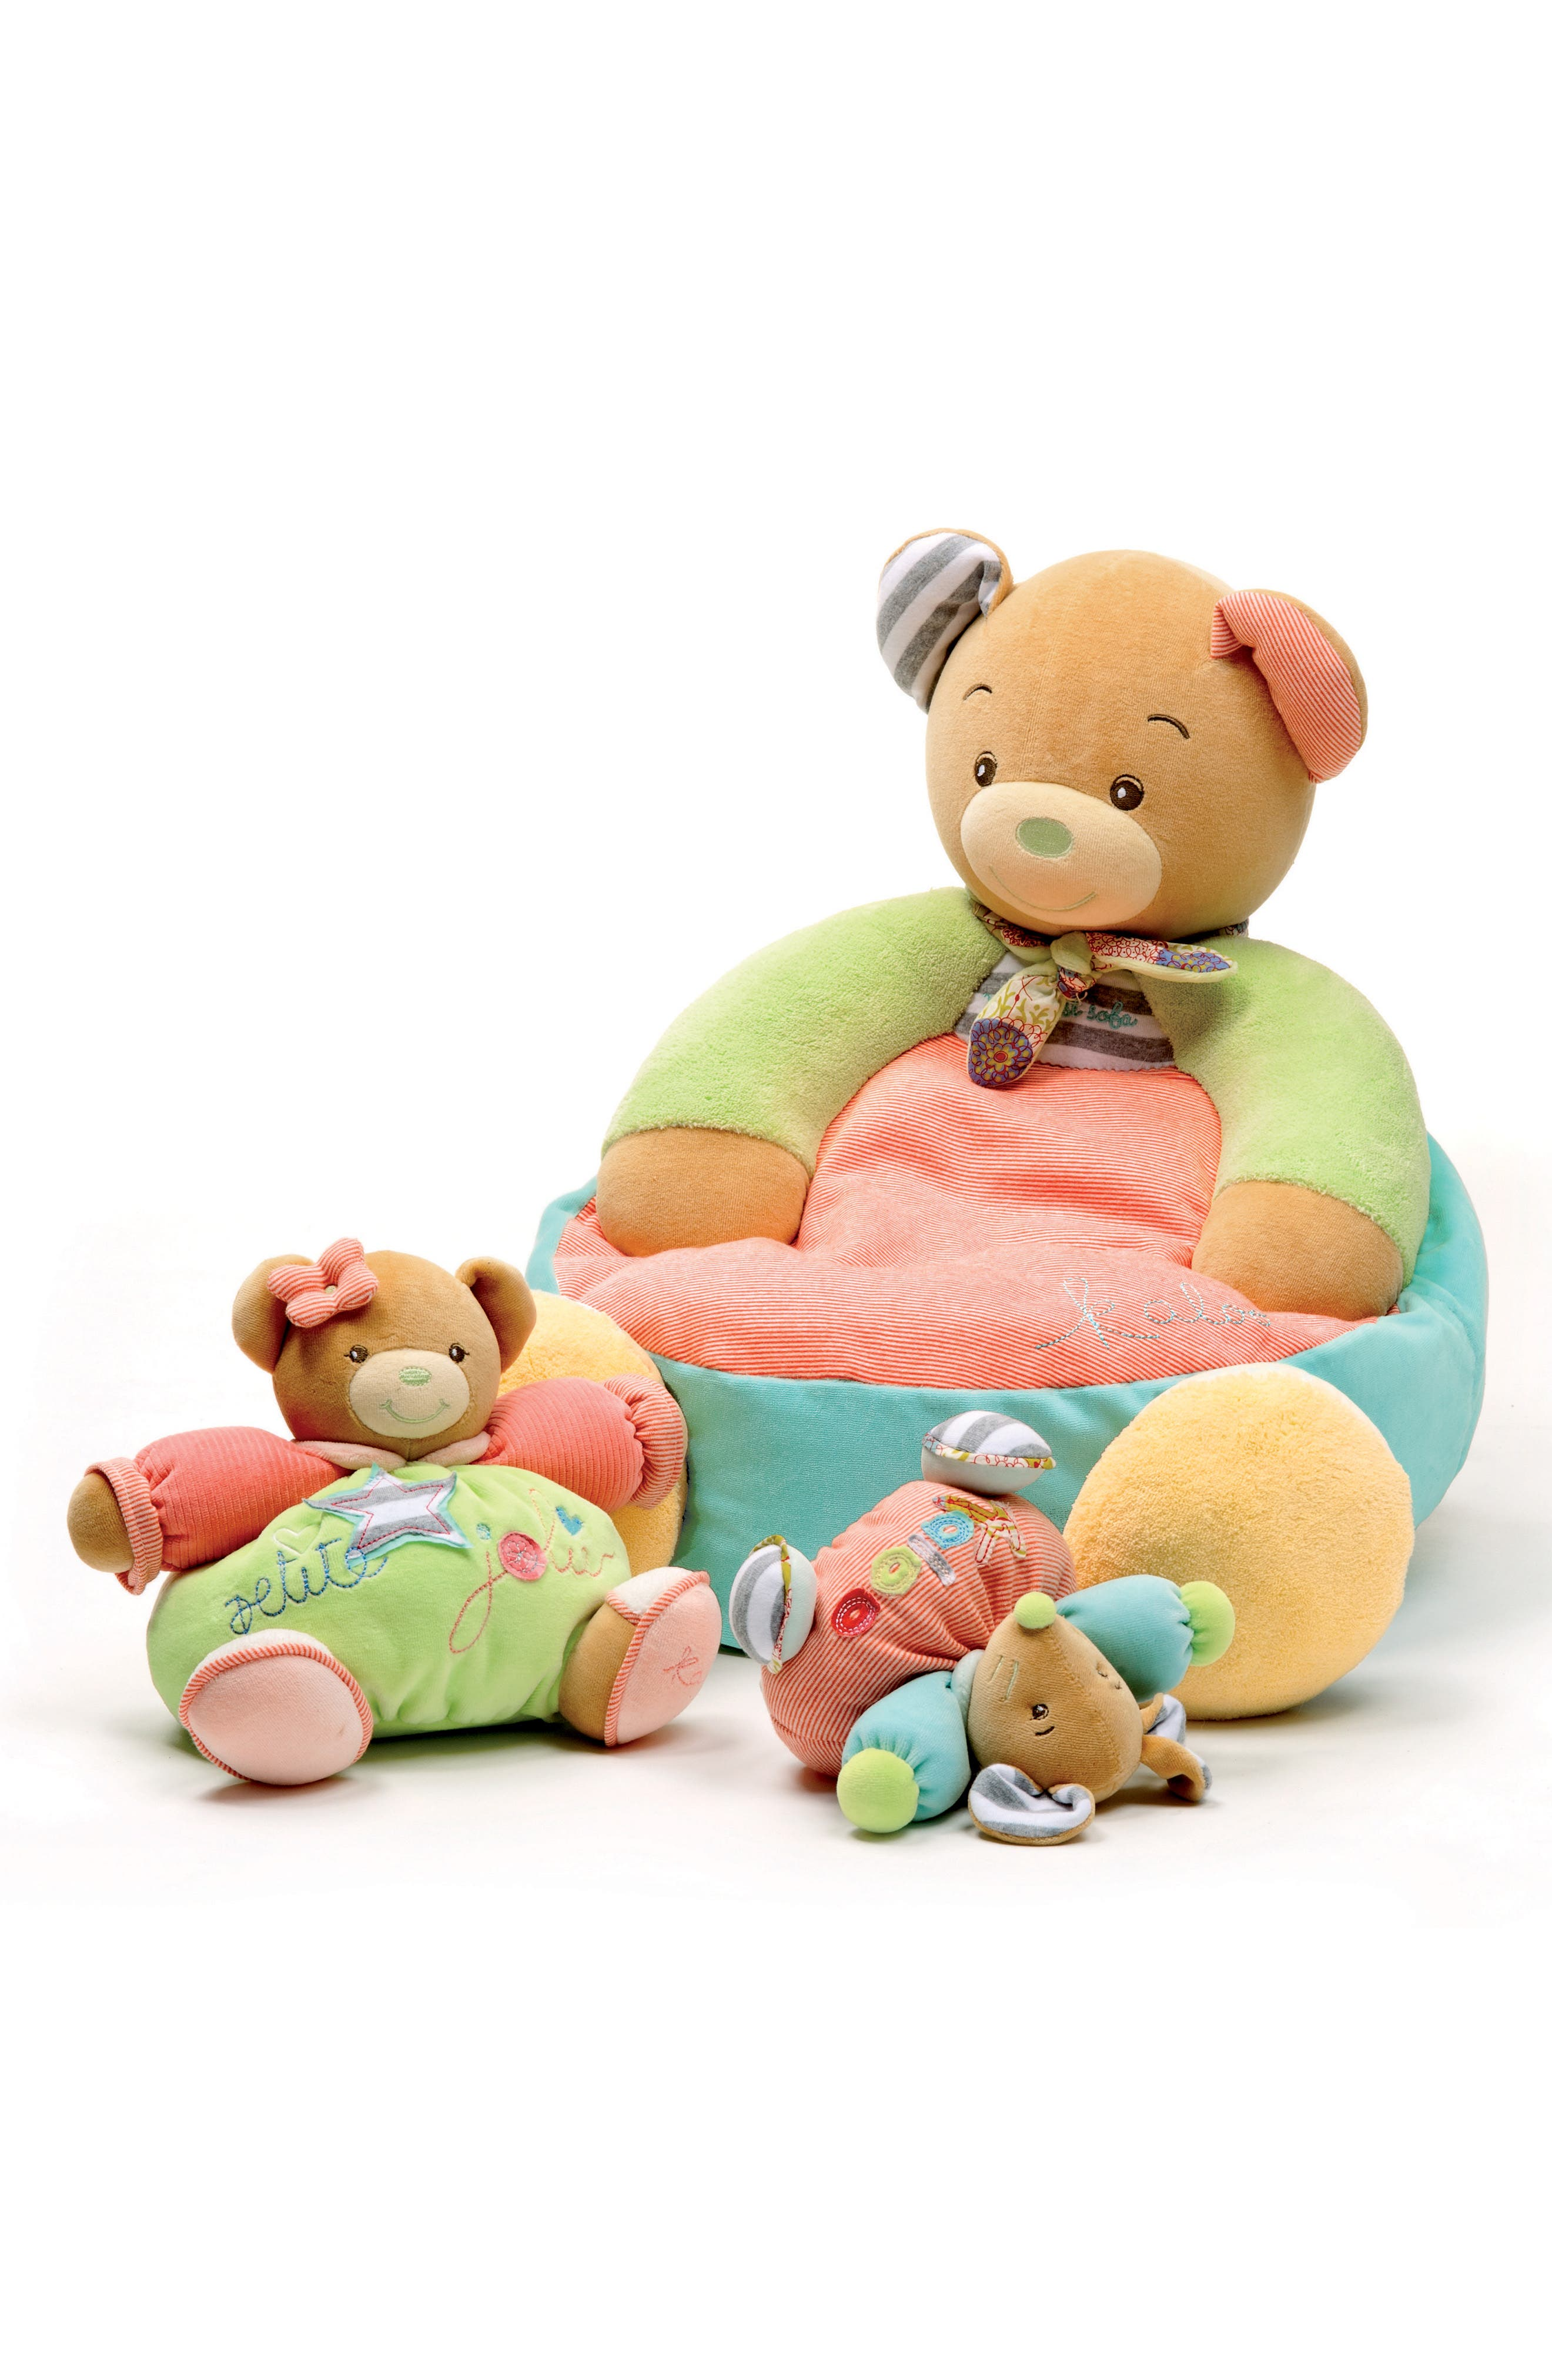 Bliss Bear Stuffed Animal,                             Main thumbnail 1, color,                             MULTI